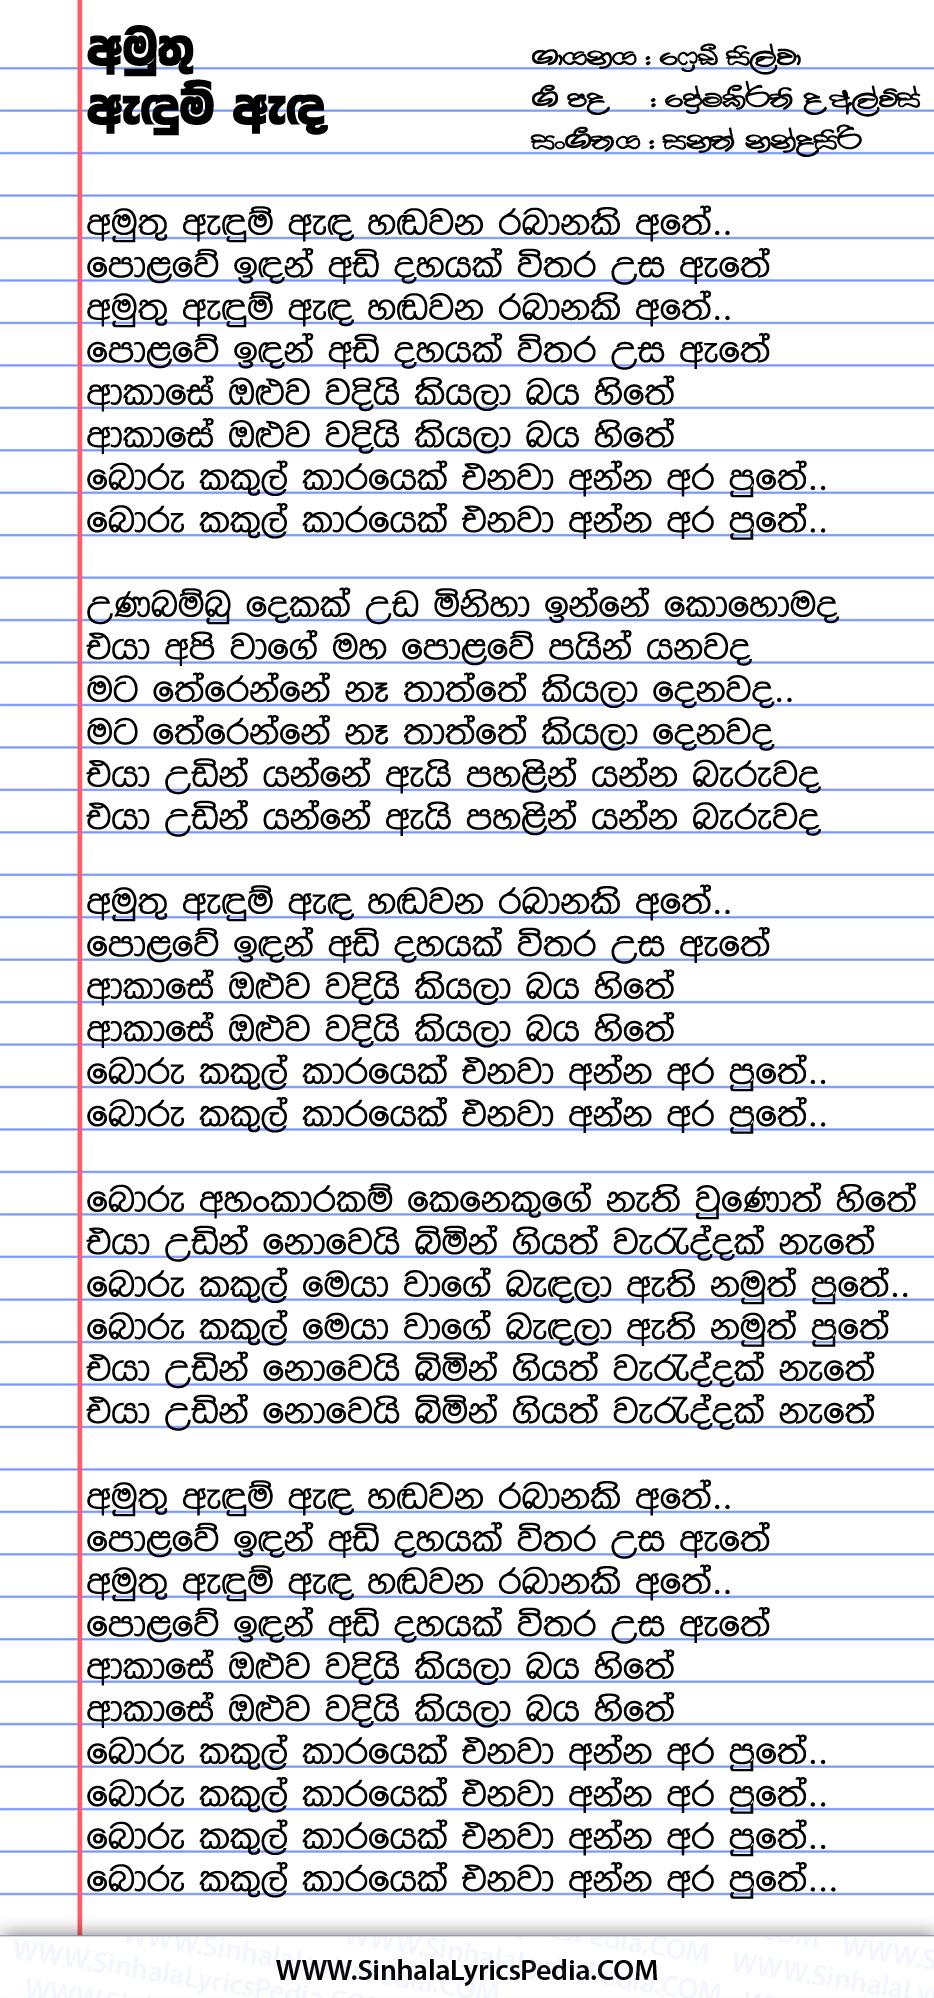 Amuthu Adum Ada Hadawana (Boru Kakul Karaya) Song Lyrics